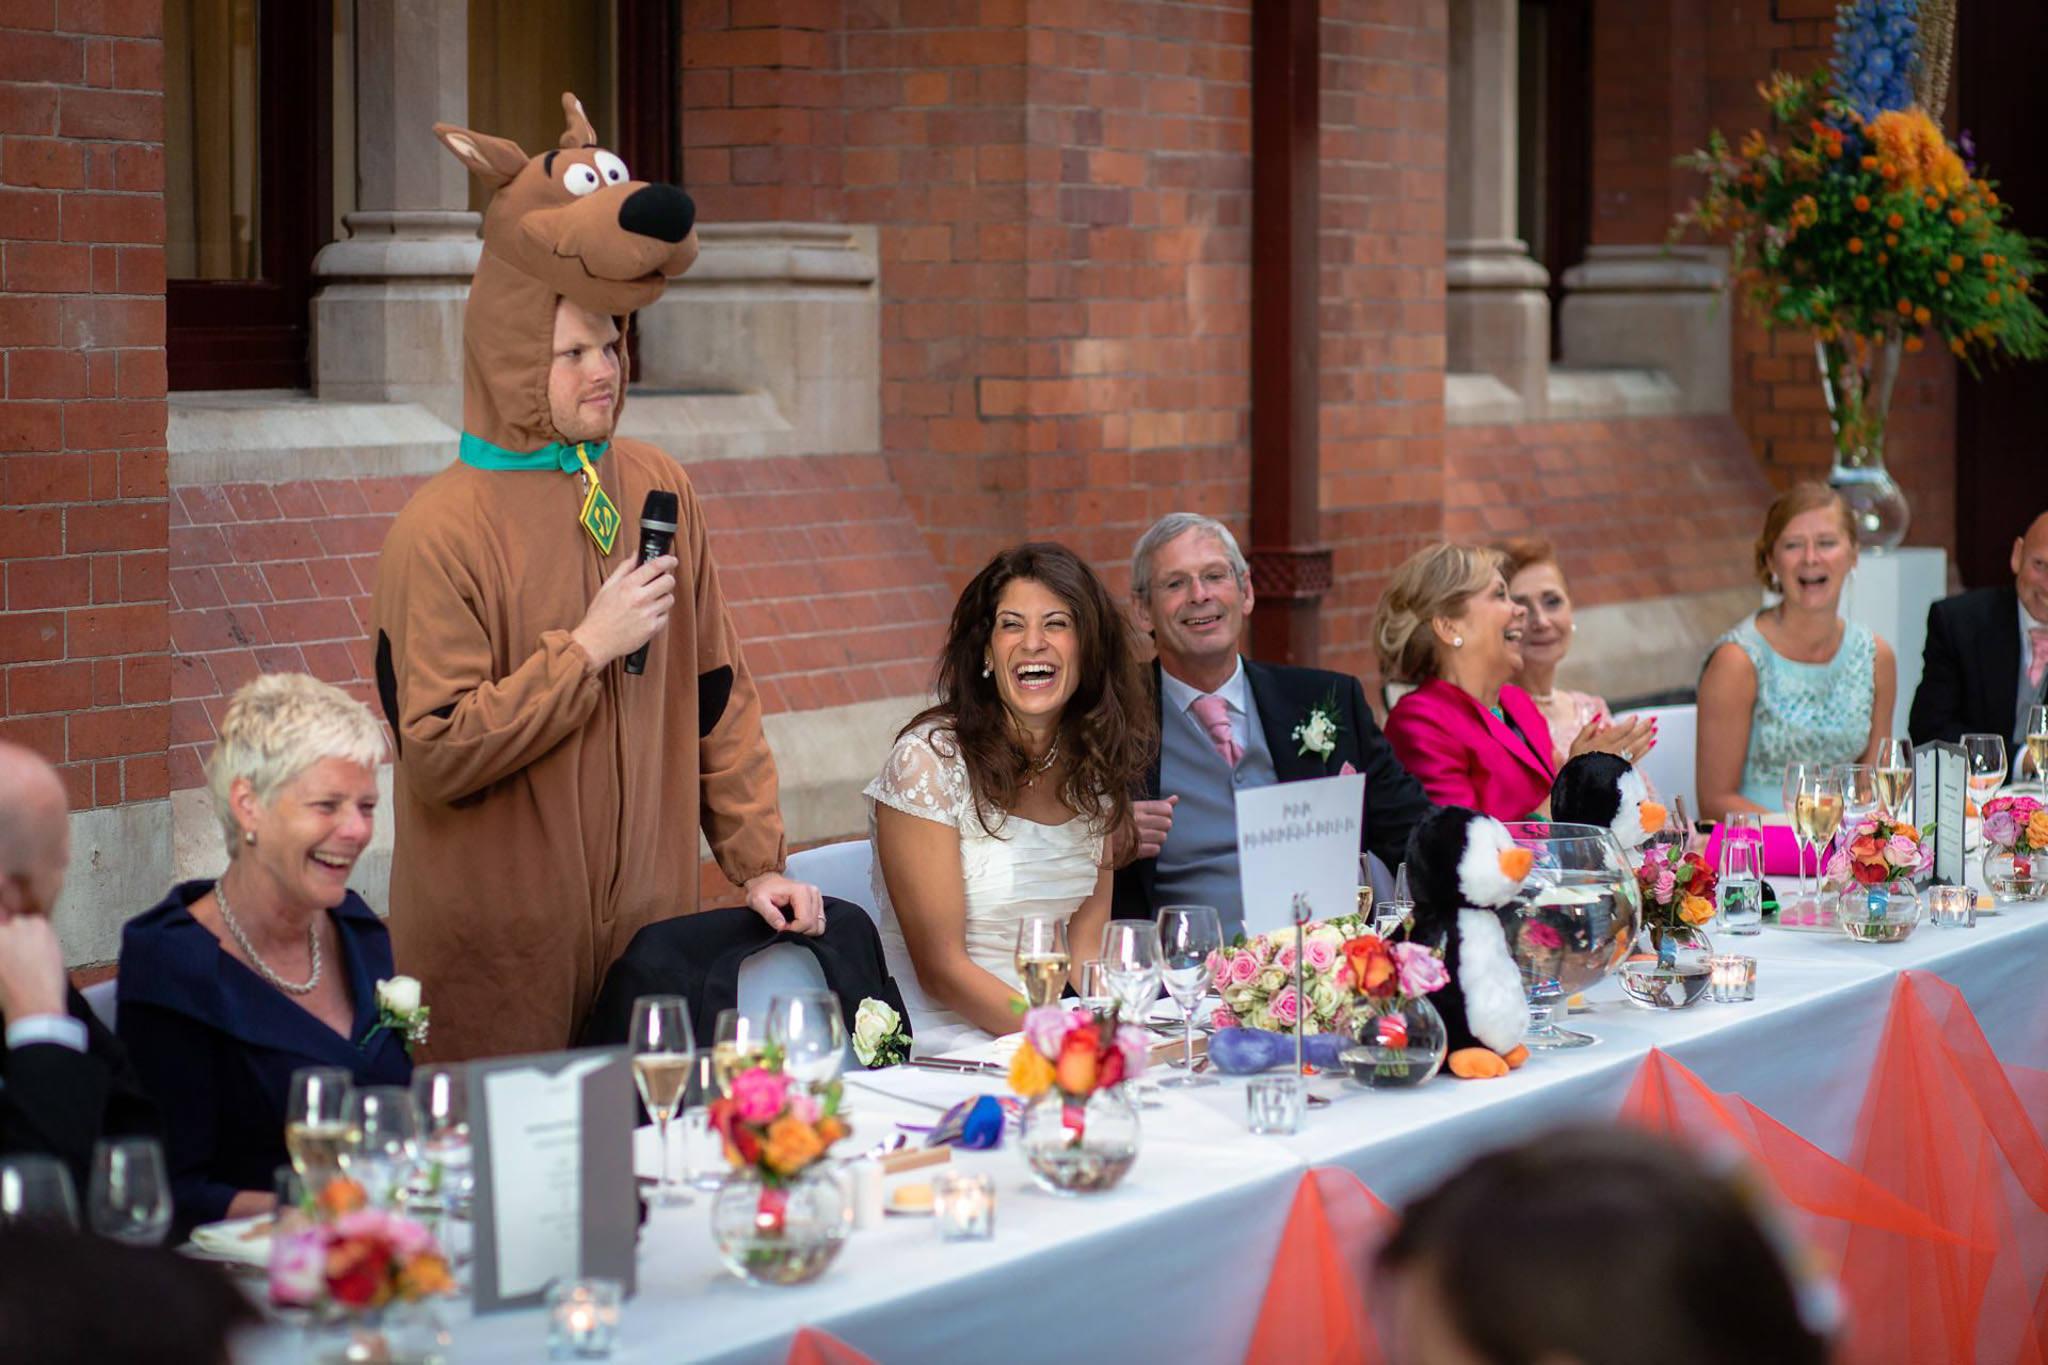 St. Pancras hotel wedding groom speech